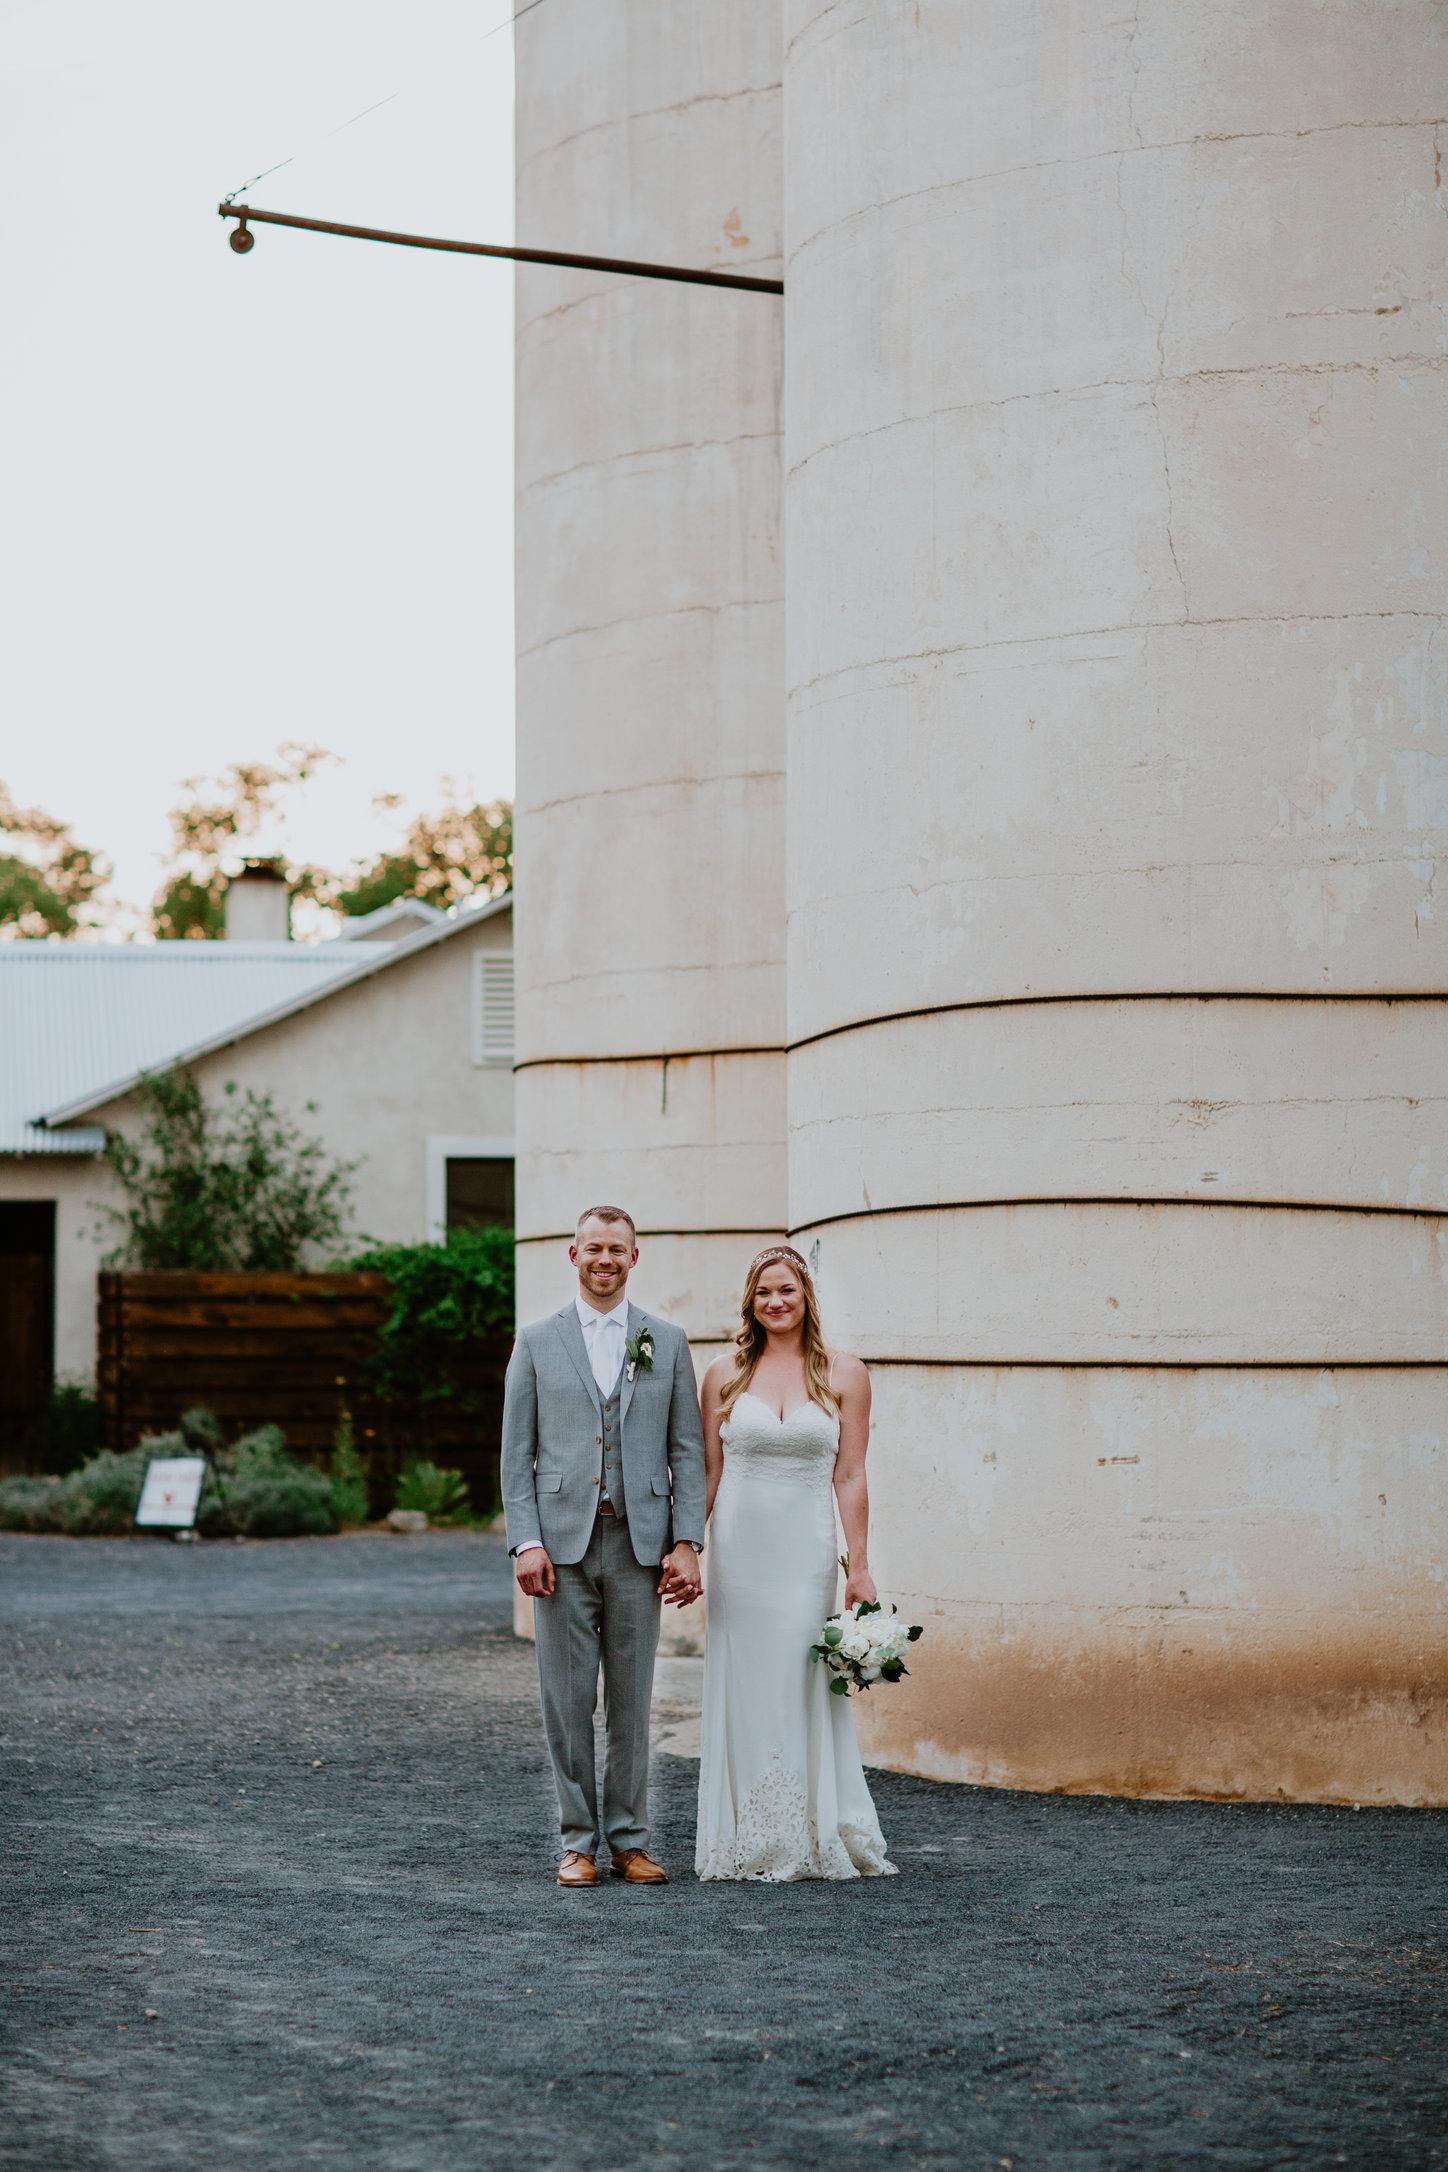 DandA-wedding-754.jpg